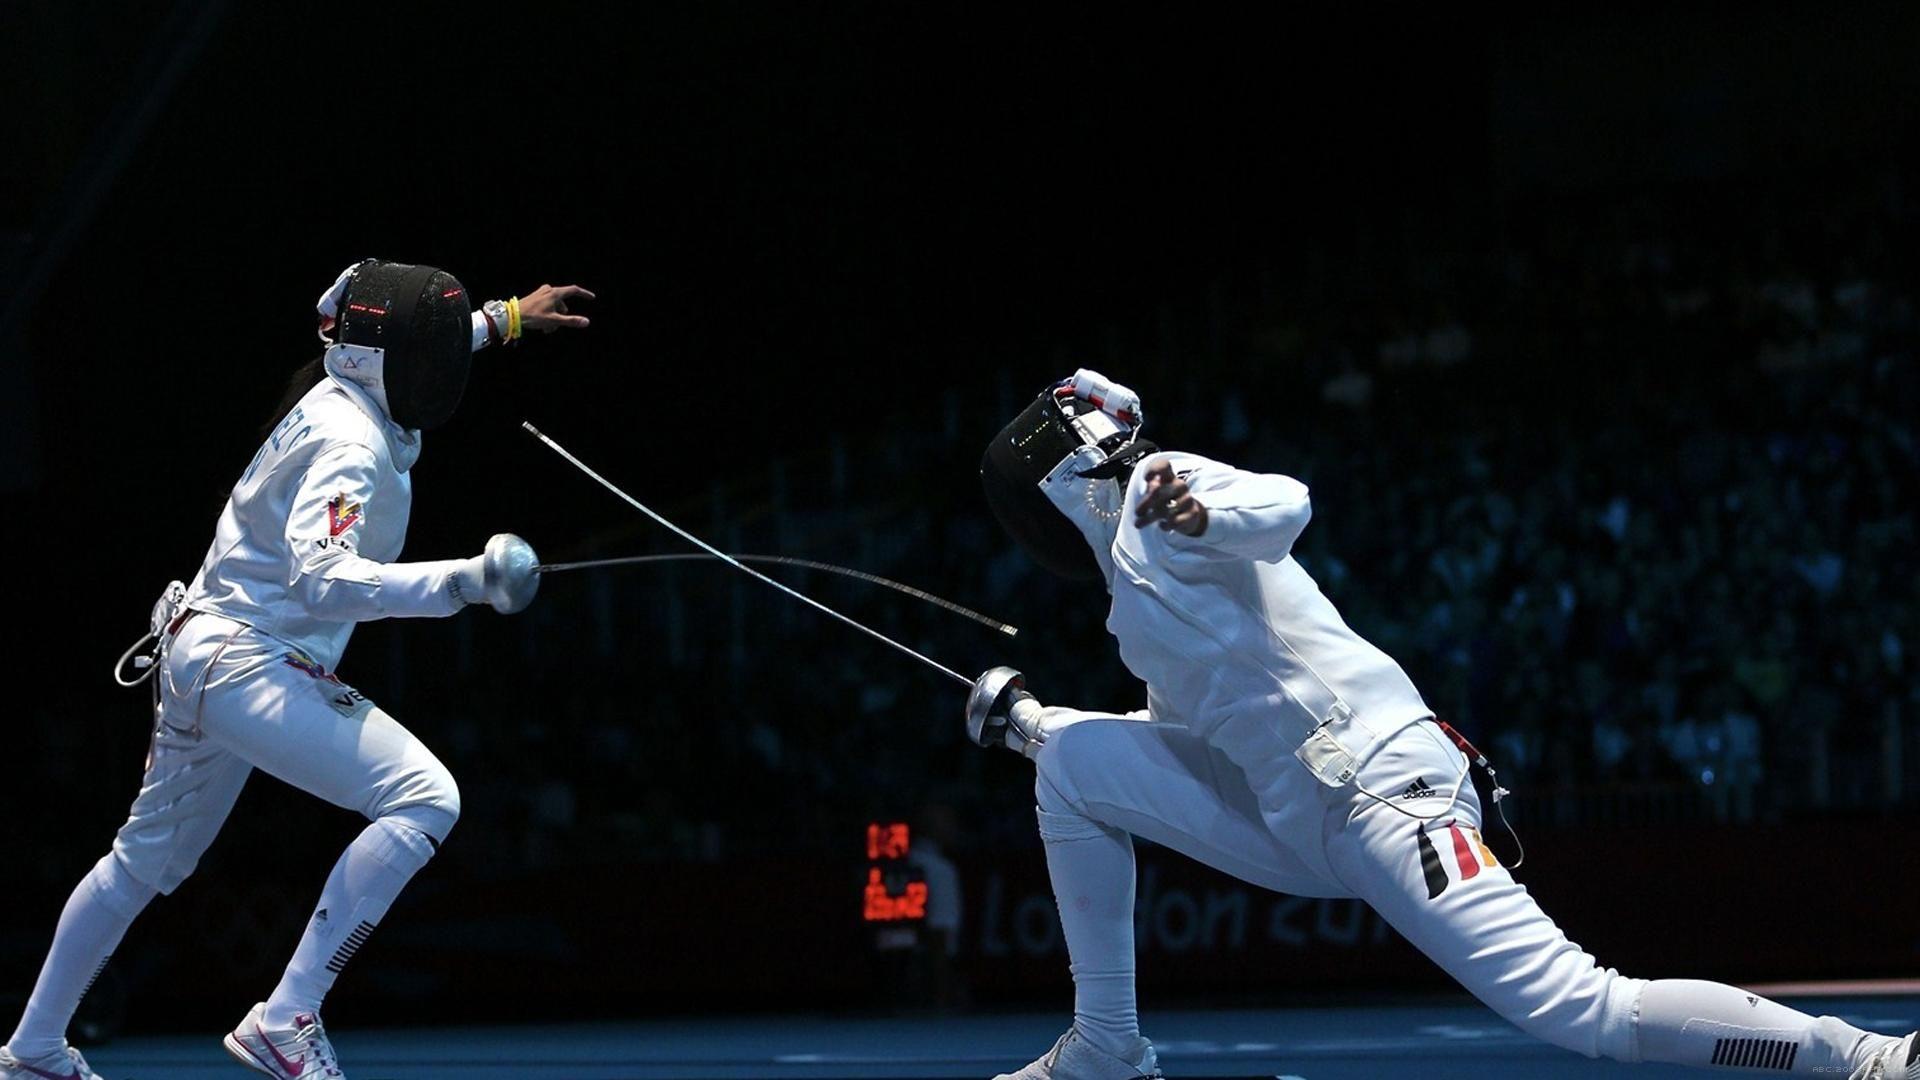 Fencing full hd image